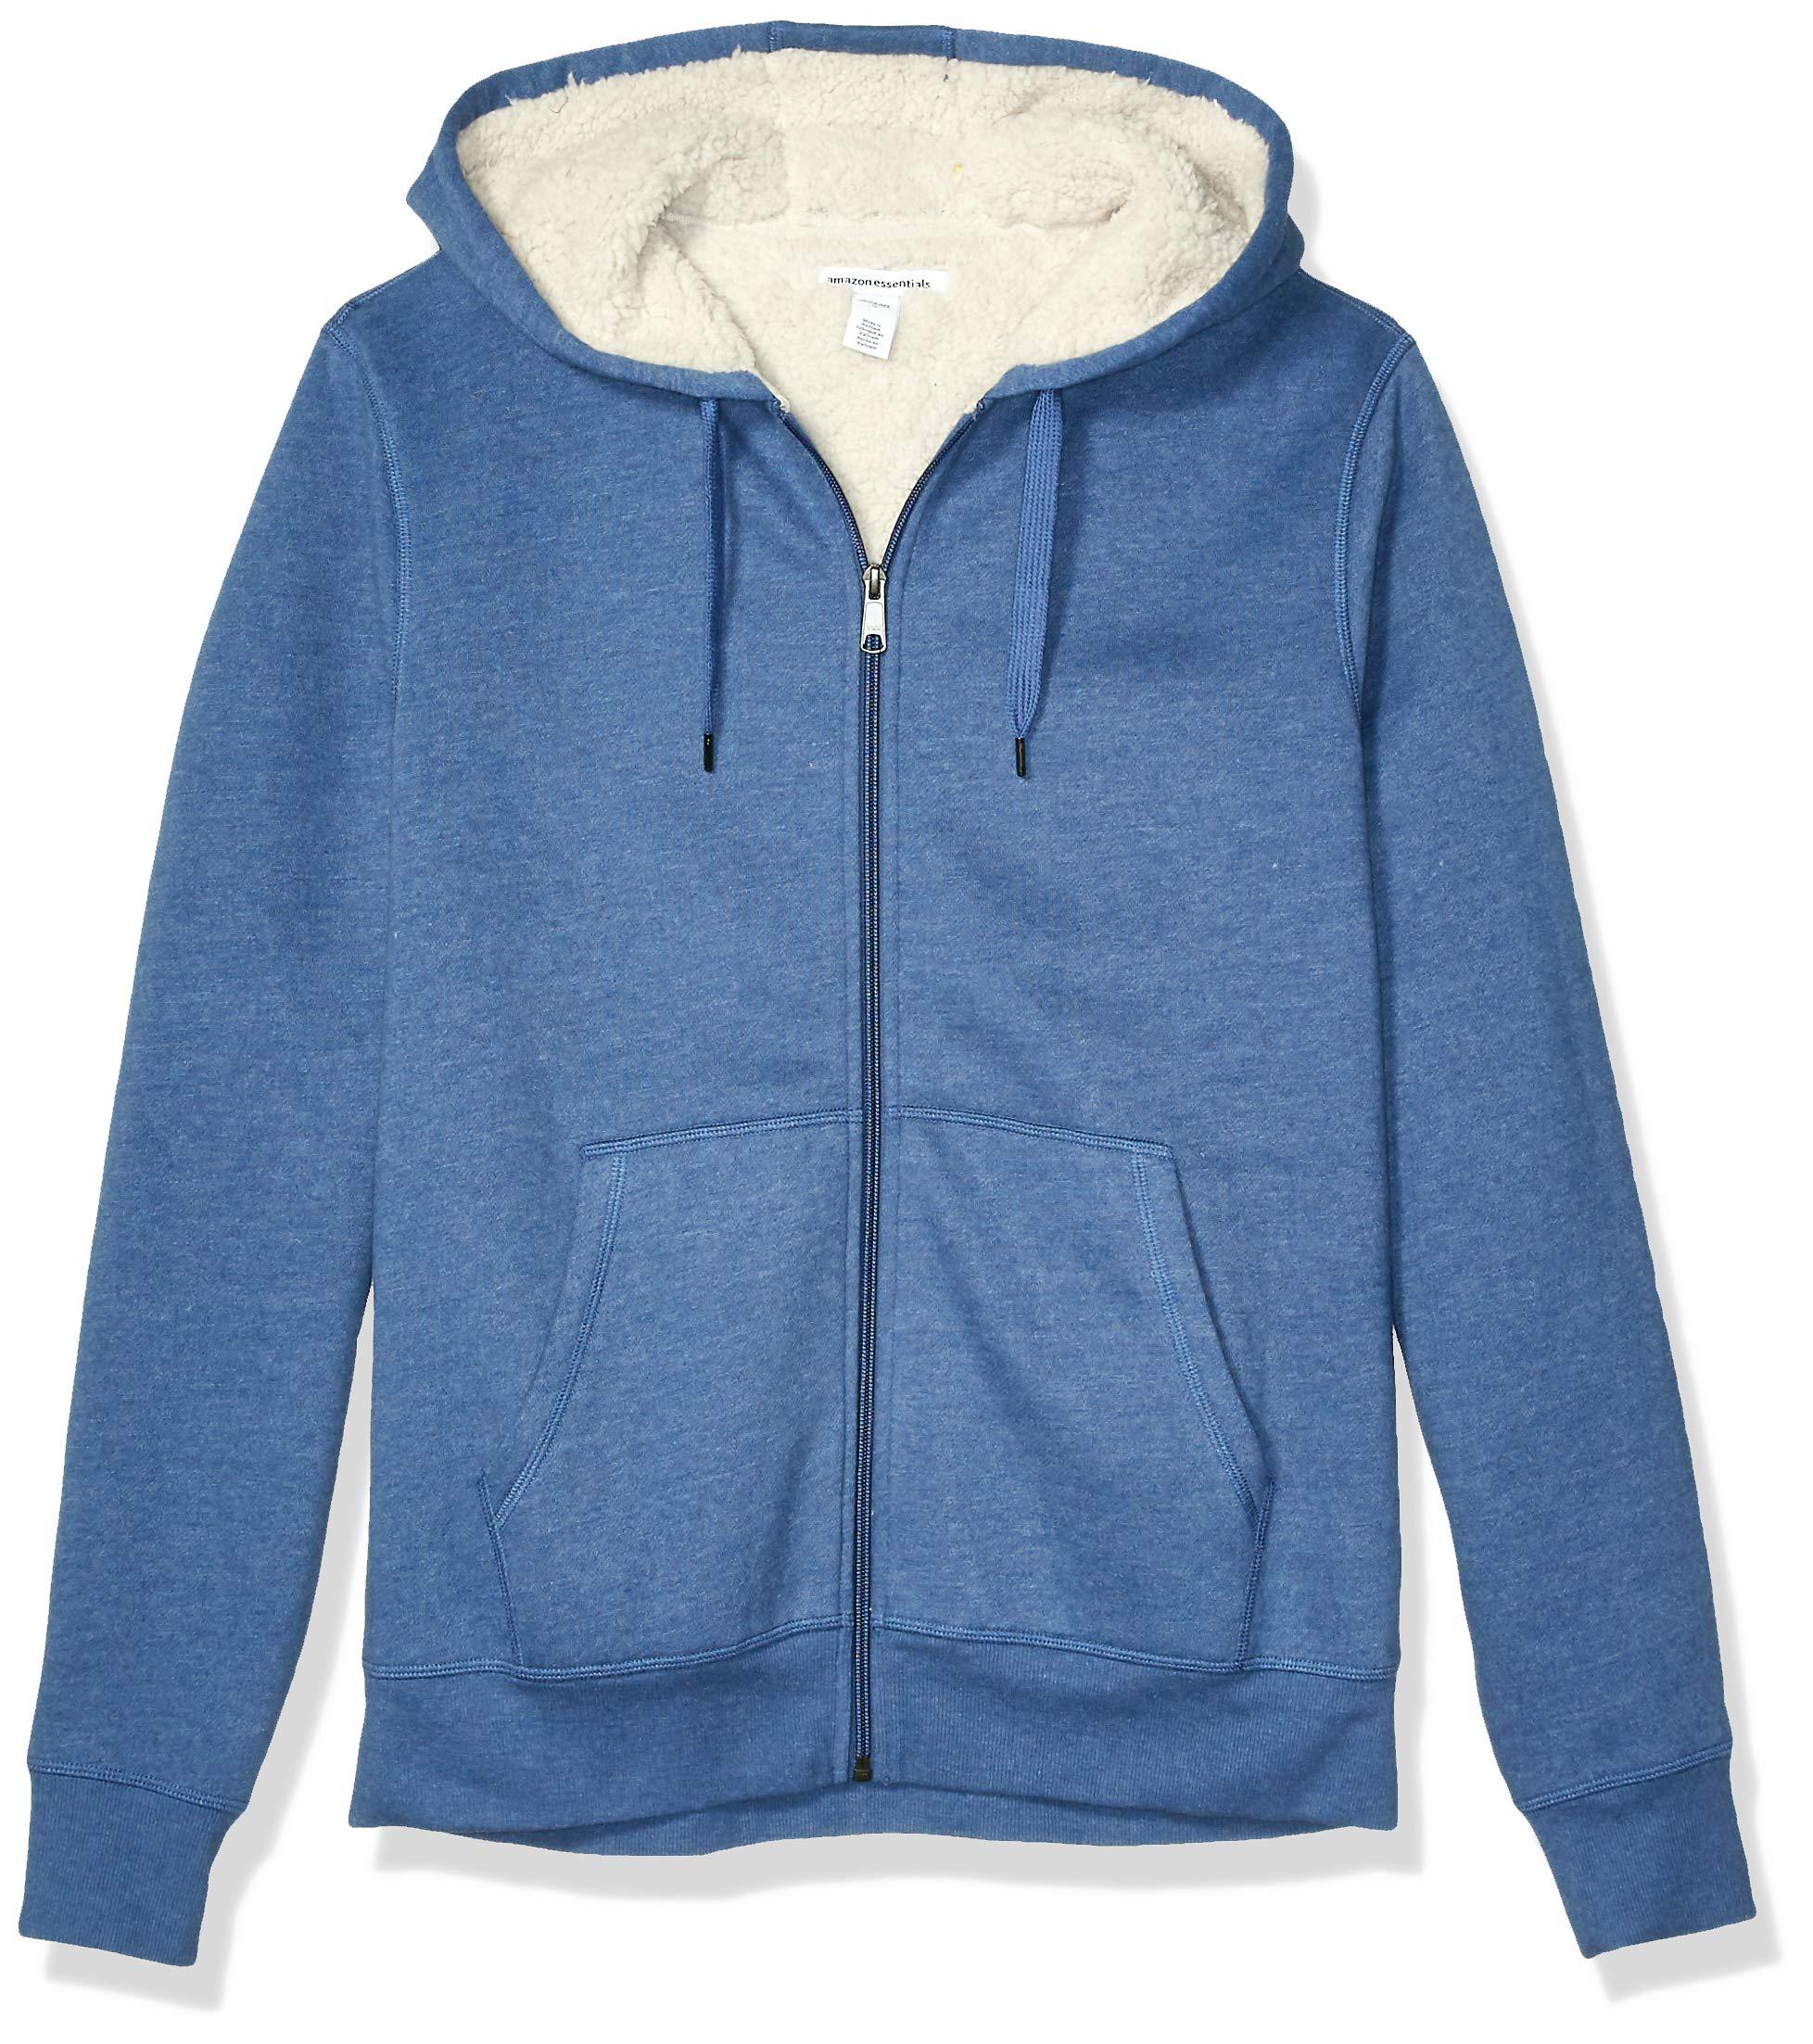 Amazon Essentials Men's Sherpa Lined Full-Zip Hooded Fleece Sweatshirt, Blue Heather, X-Large by Amazon Essentials